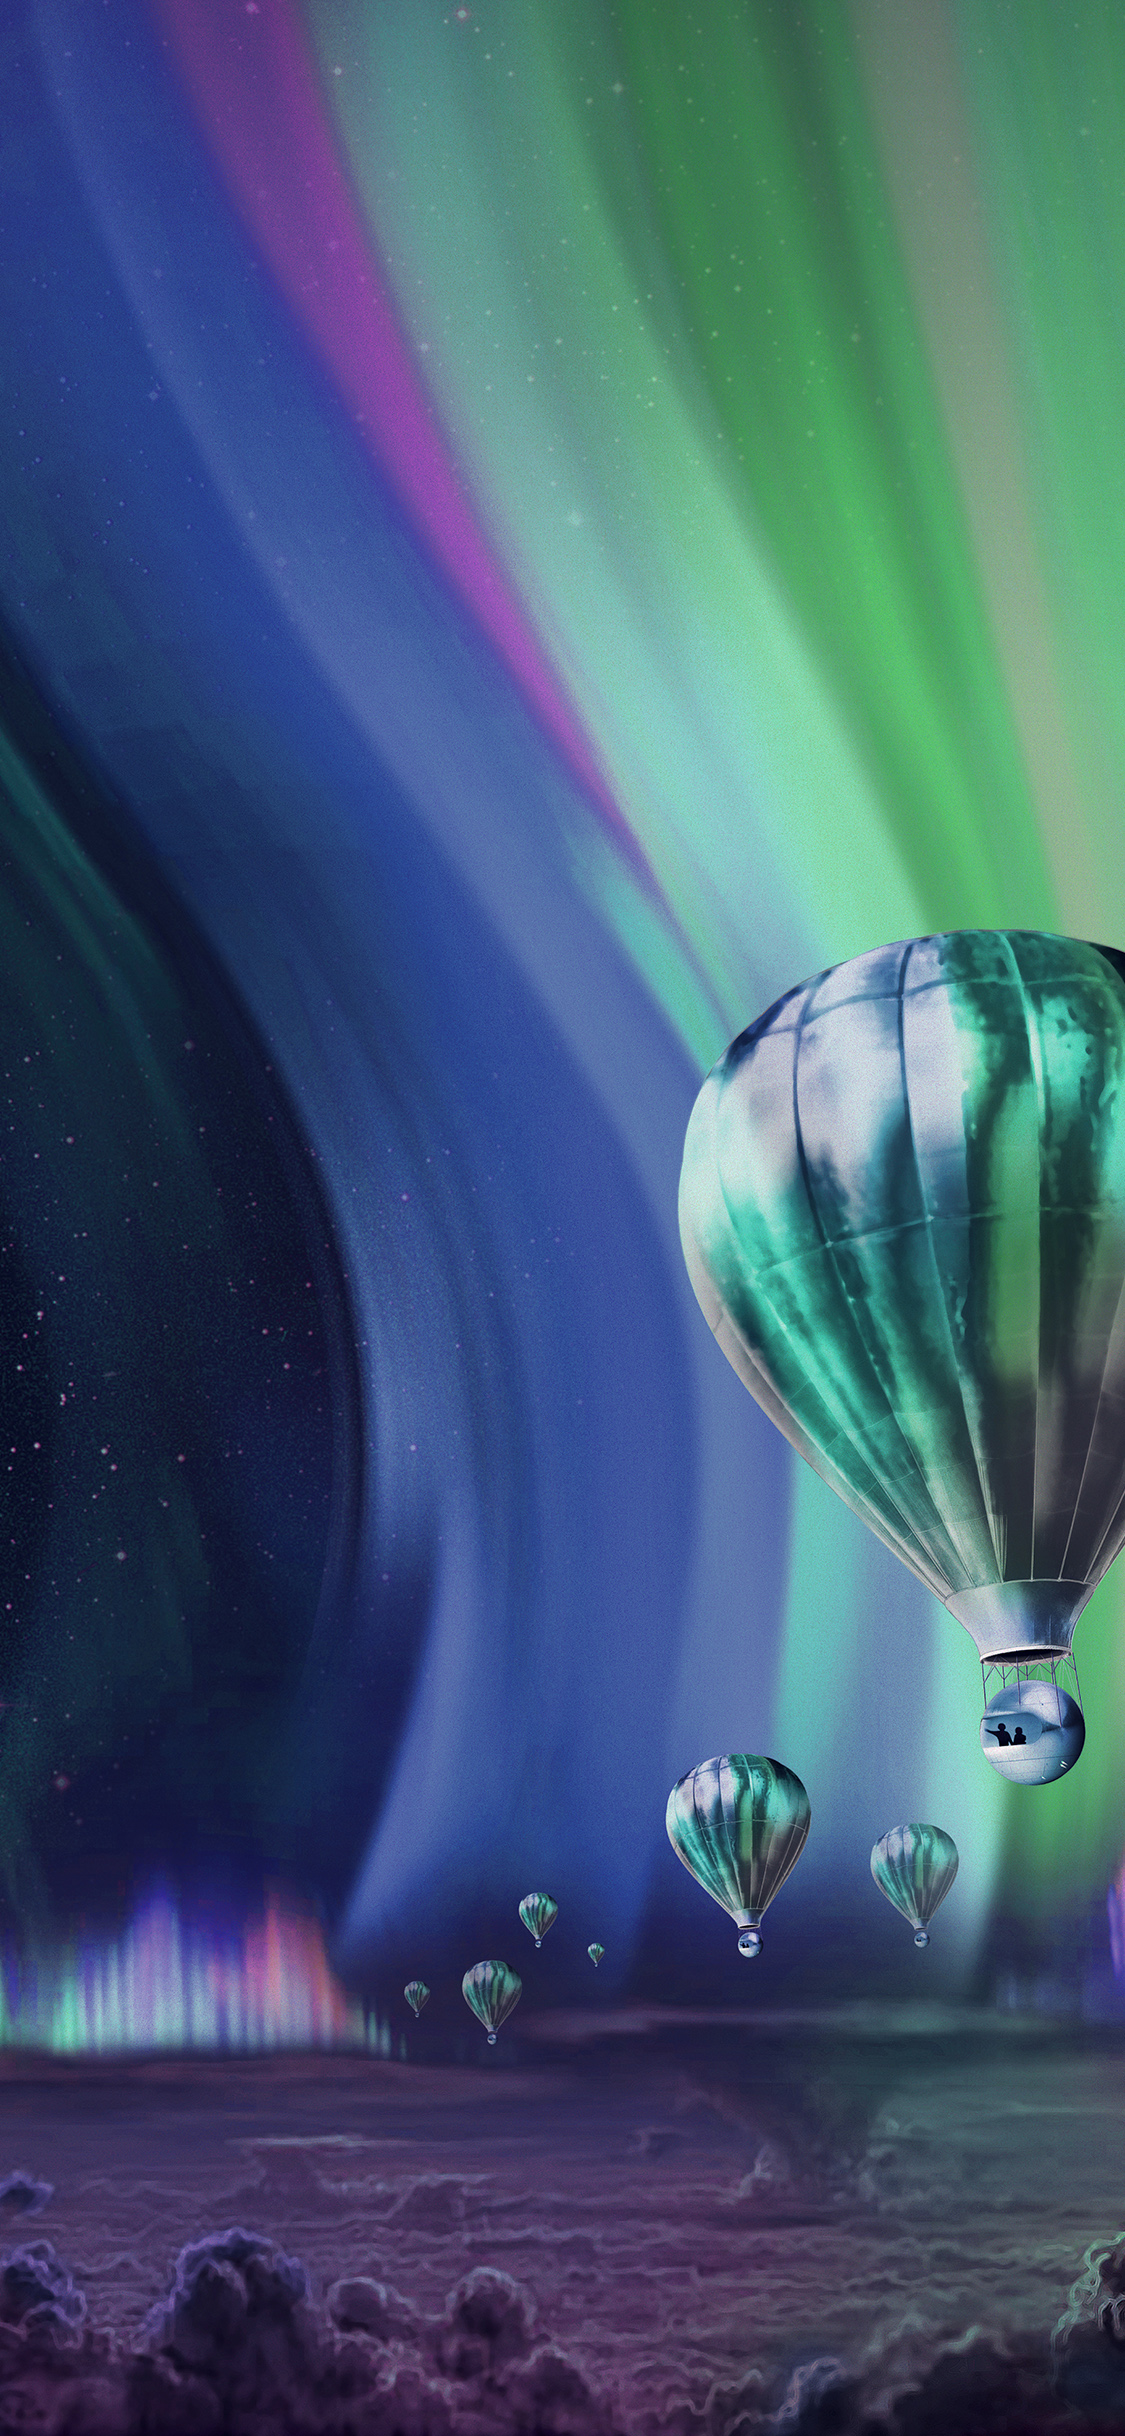 Iphonexpapers Com Iphone X Wallpaper Ap38 Jupiter Aurora